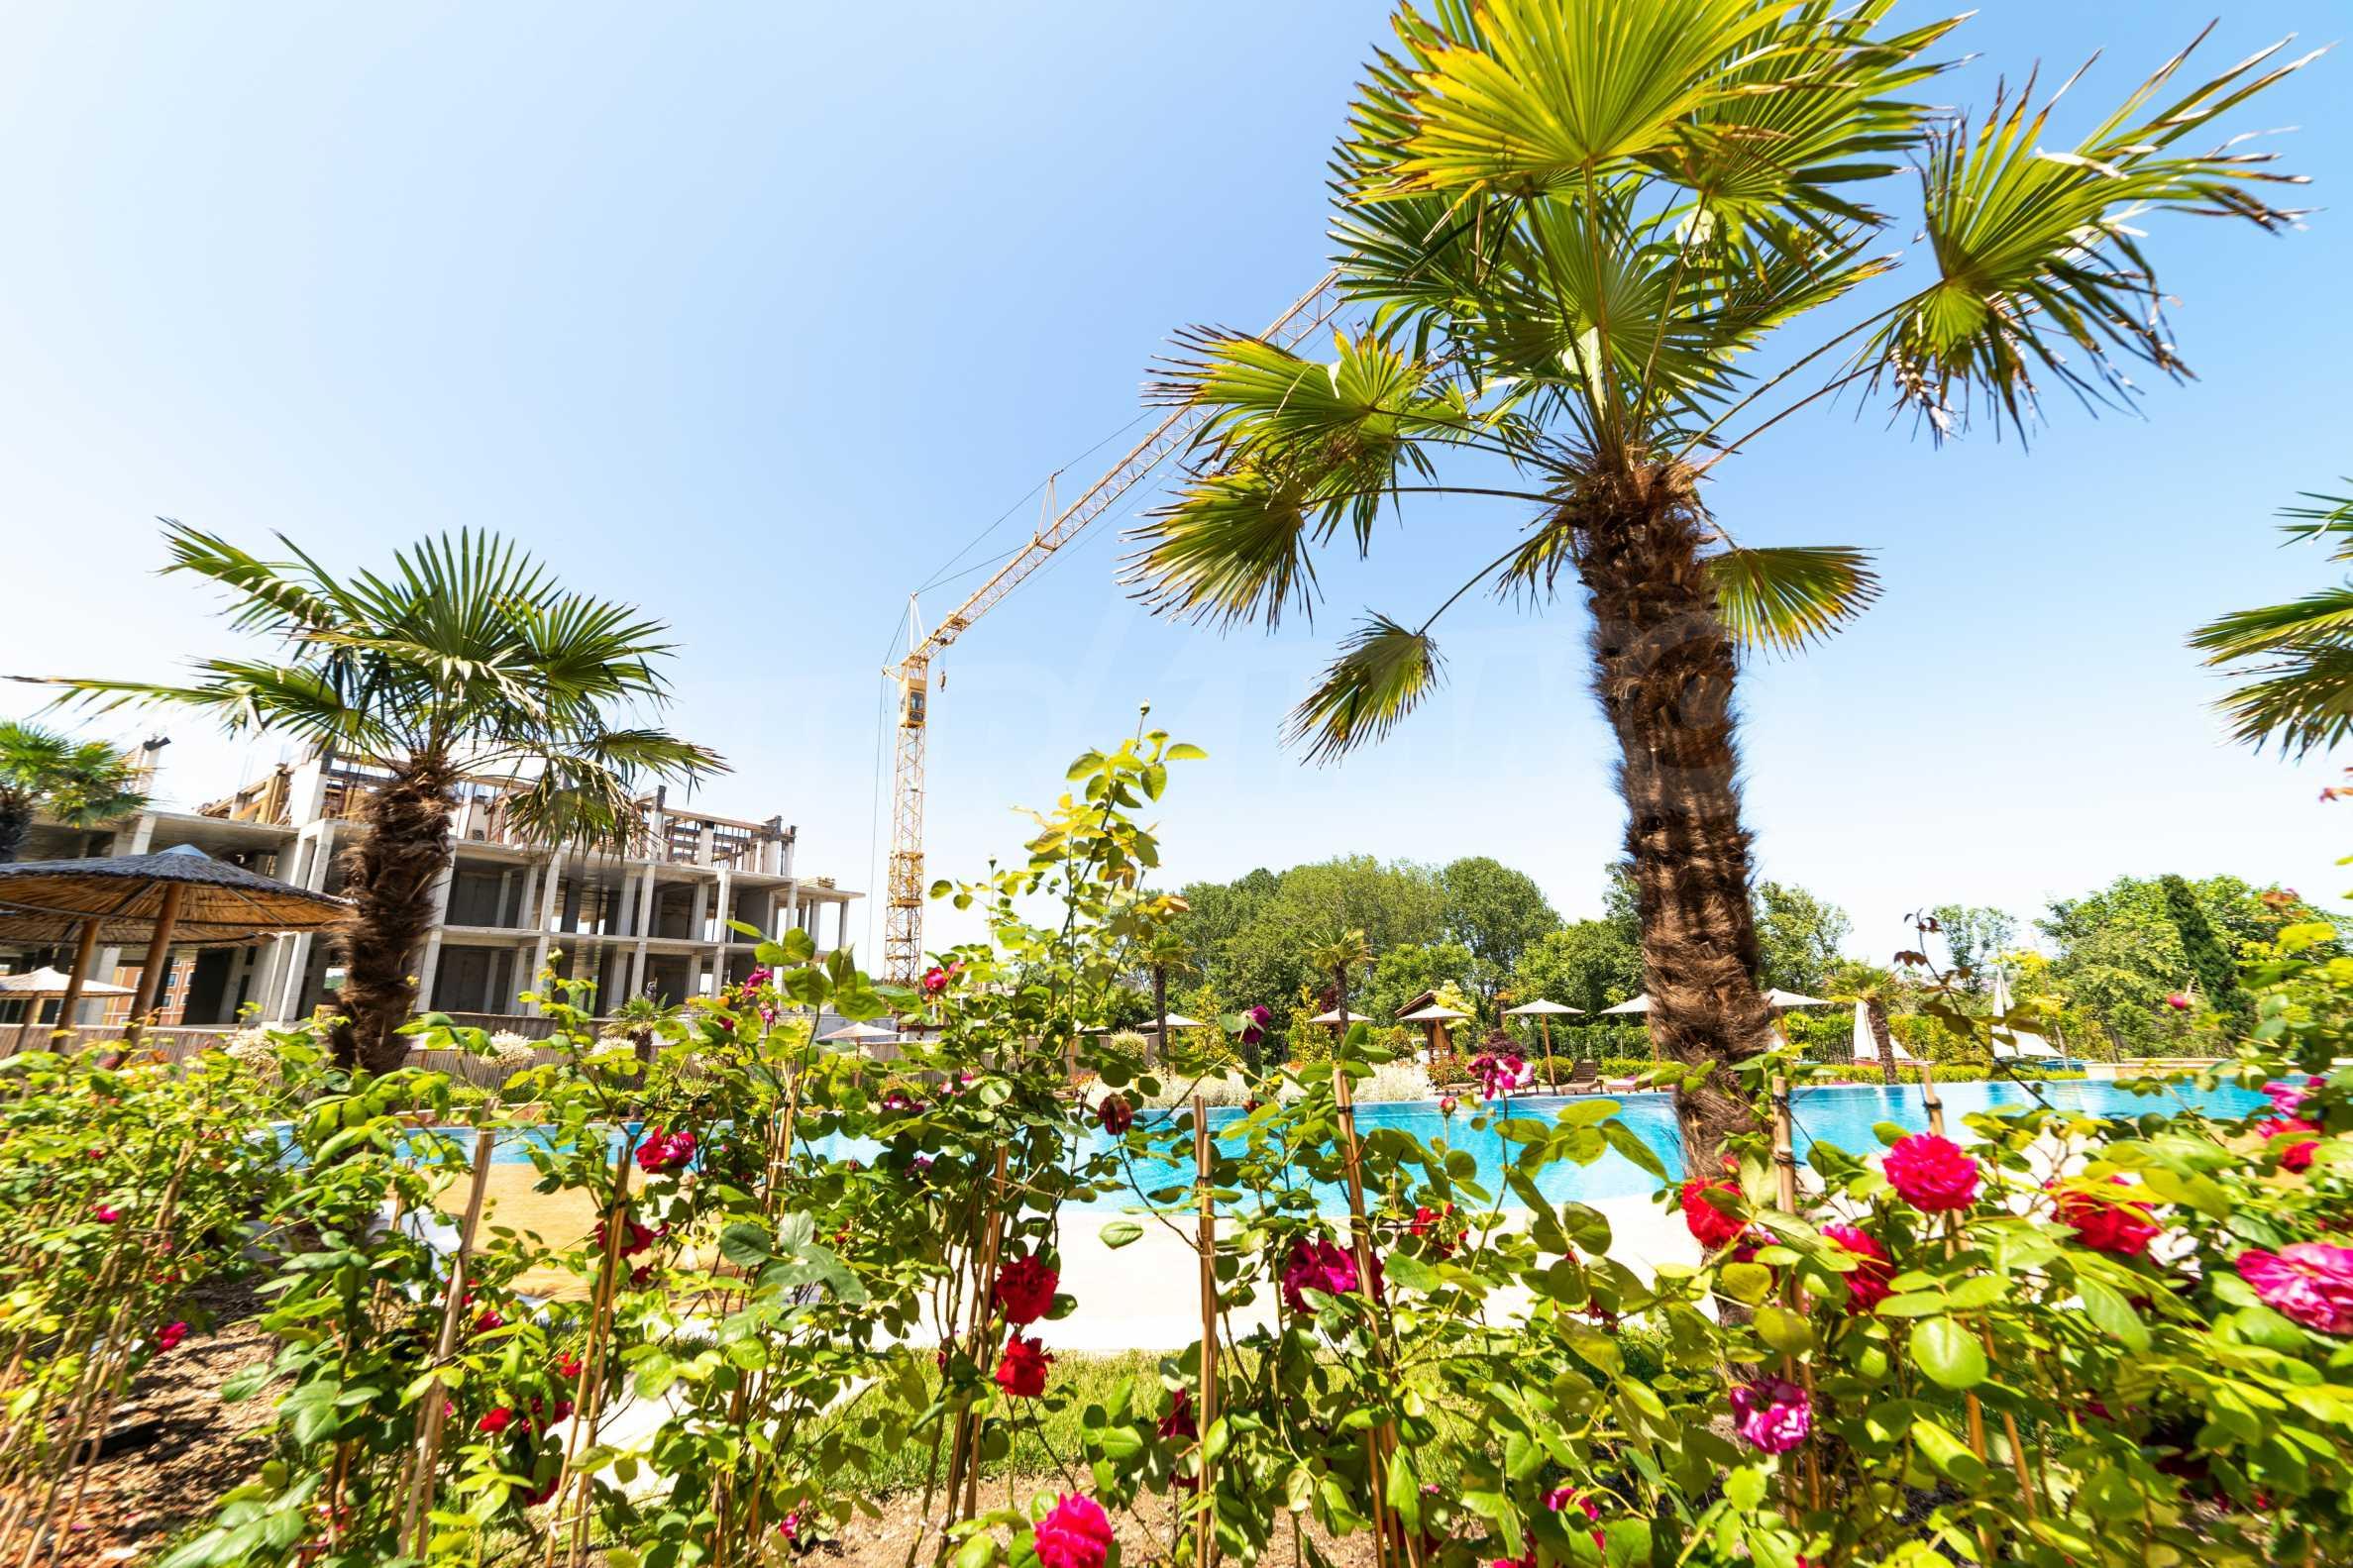 New 1-bedroom apartment in a coastal complex by the Kavatsite Beach (Sozopol) 12